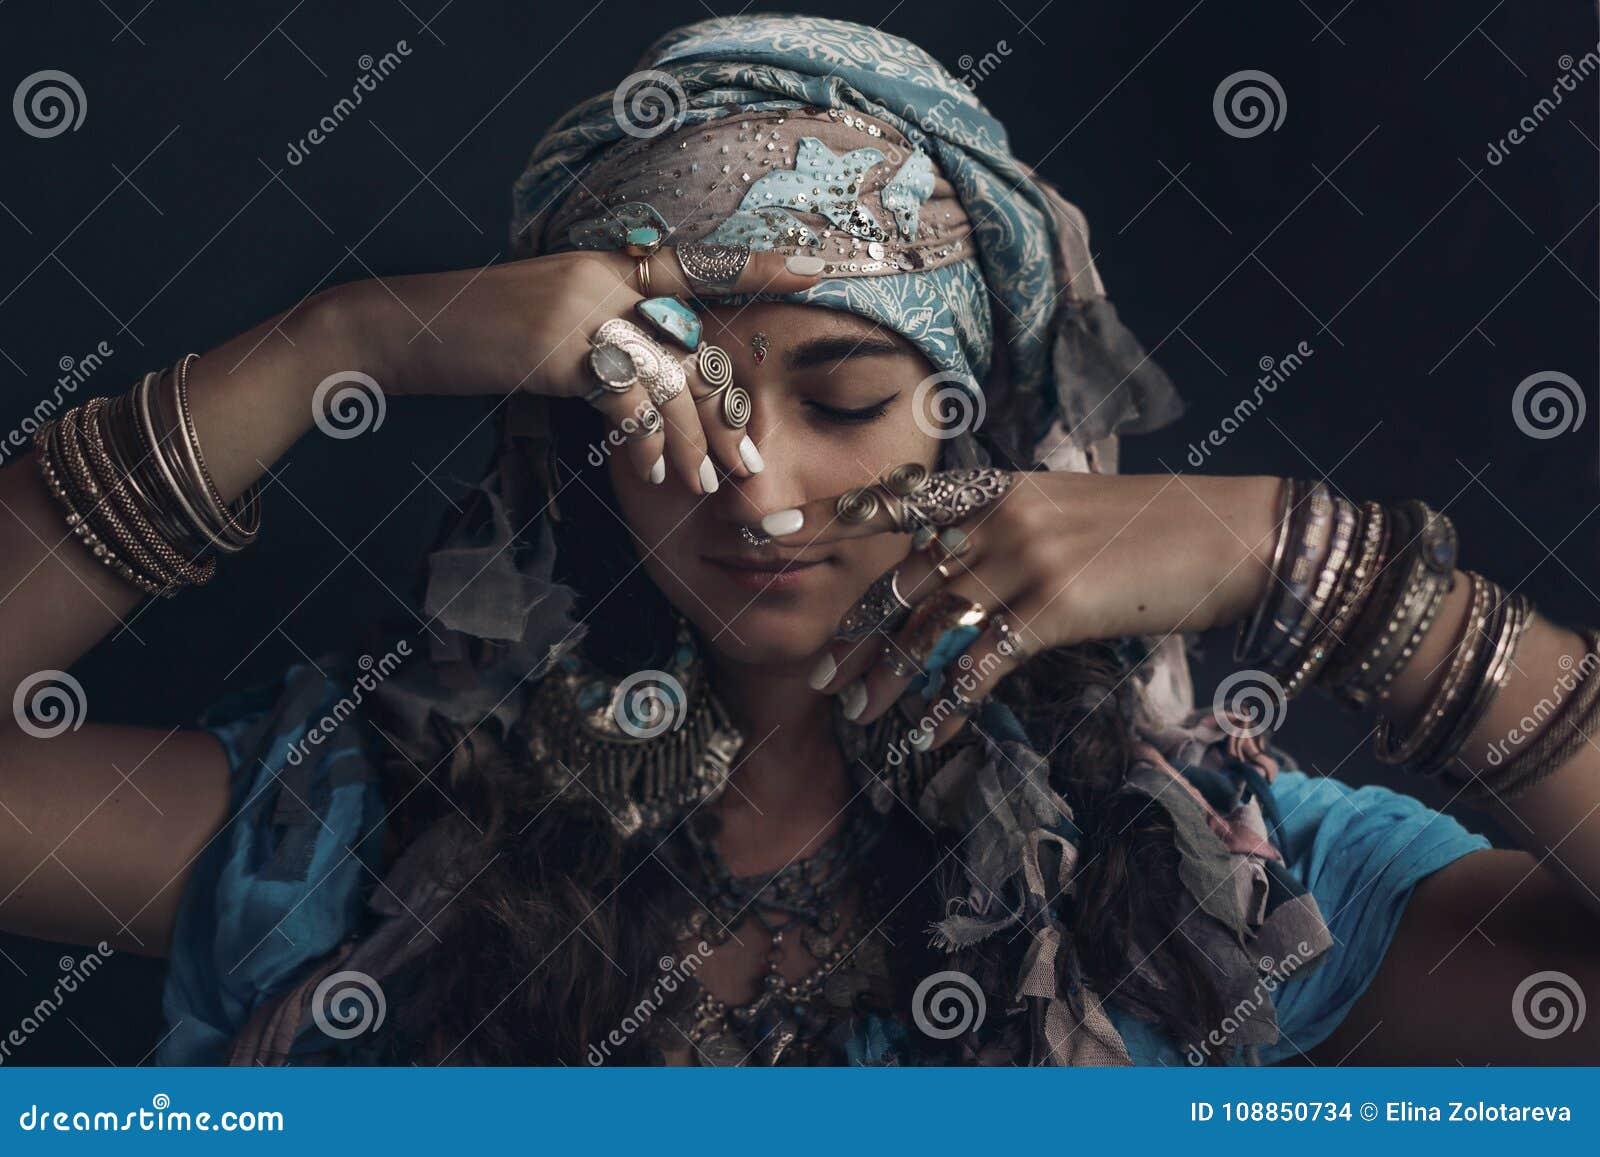 Gypsy style young woman wearing tribal jewellery portrait